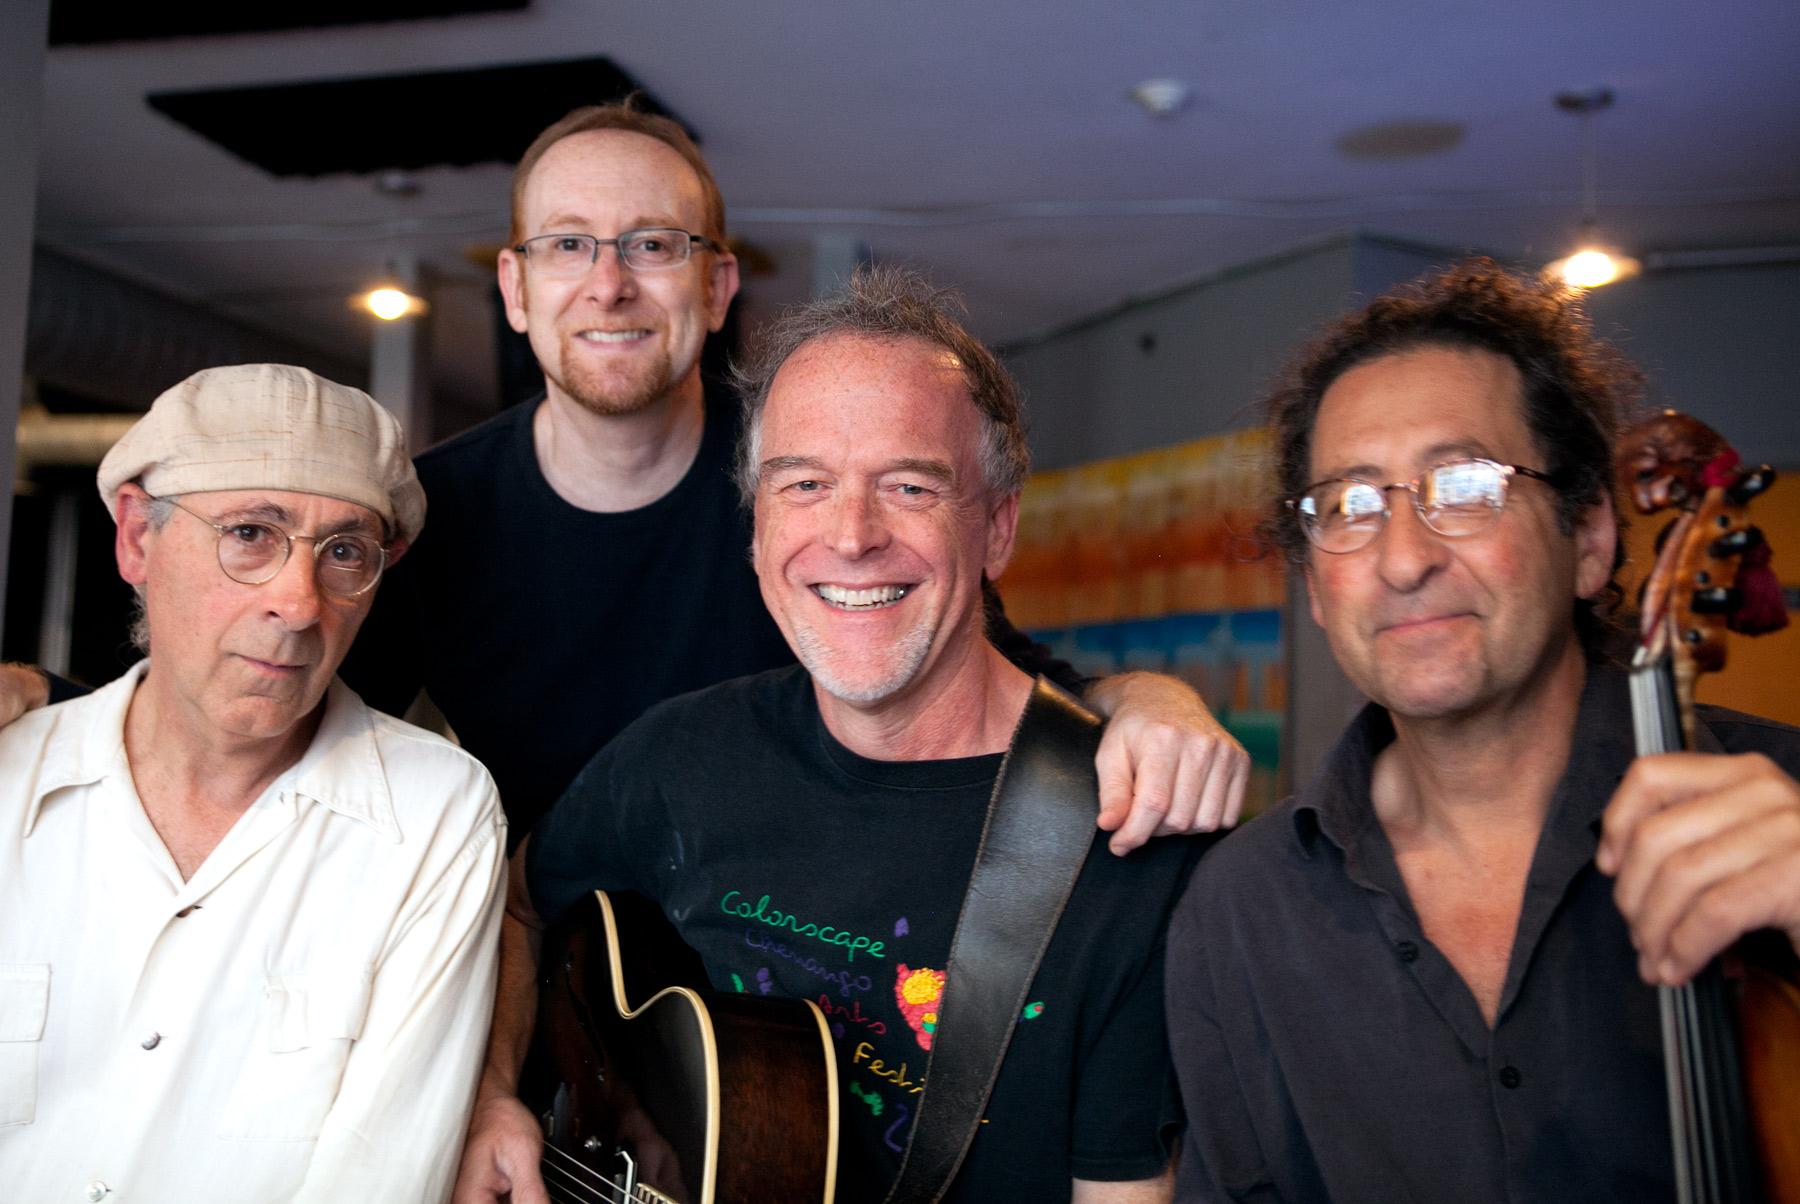 Harry Aceto, Chad Lieberman, Doug Robinson and Eric Aceto